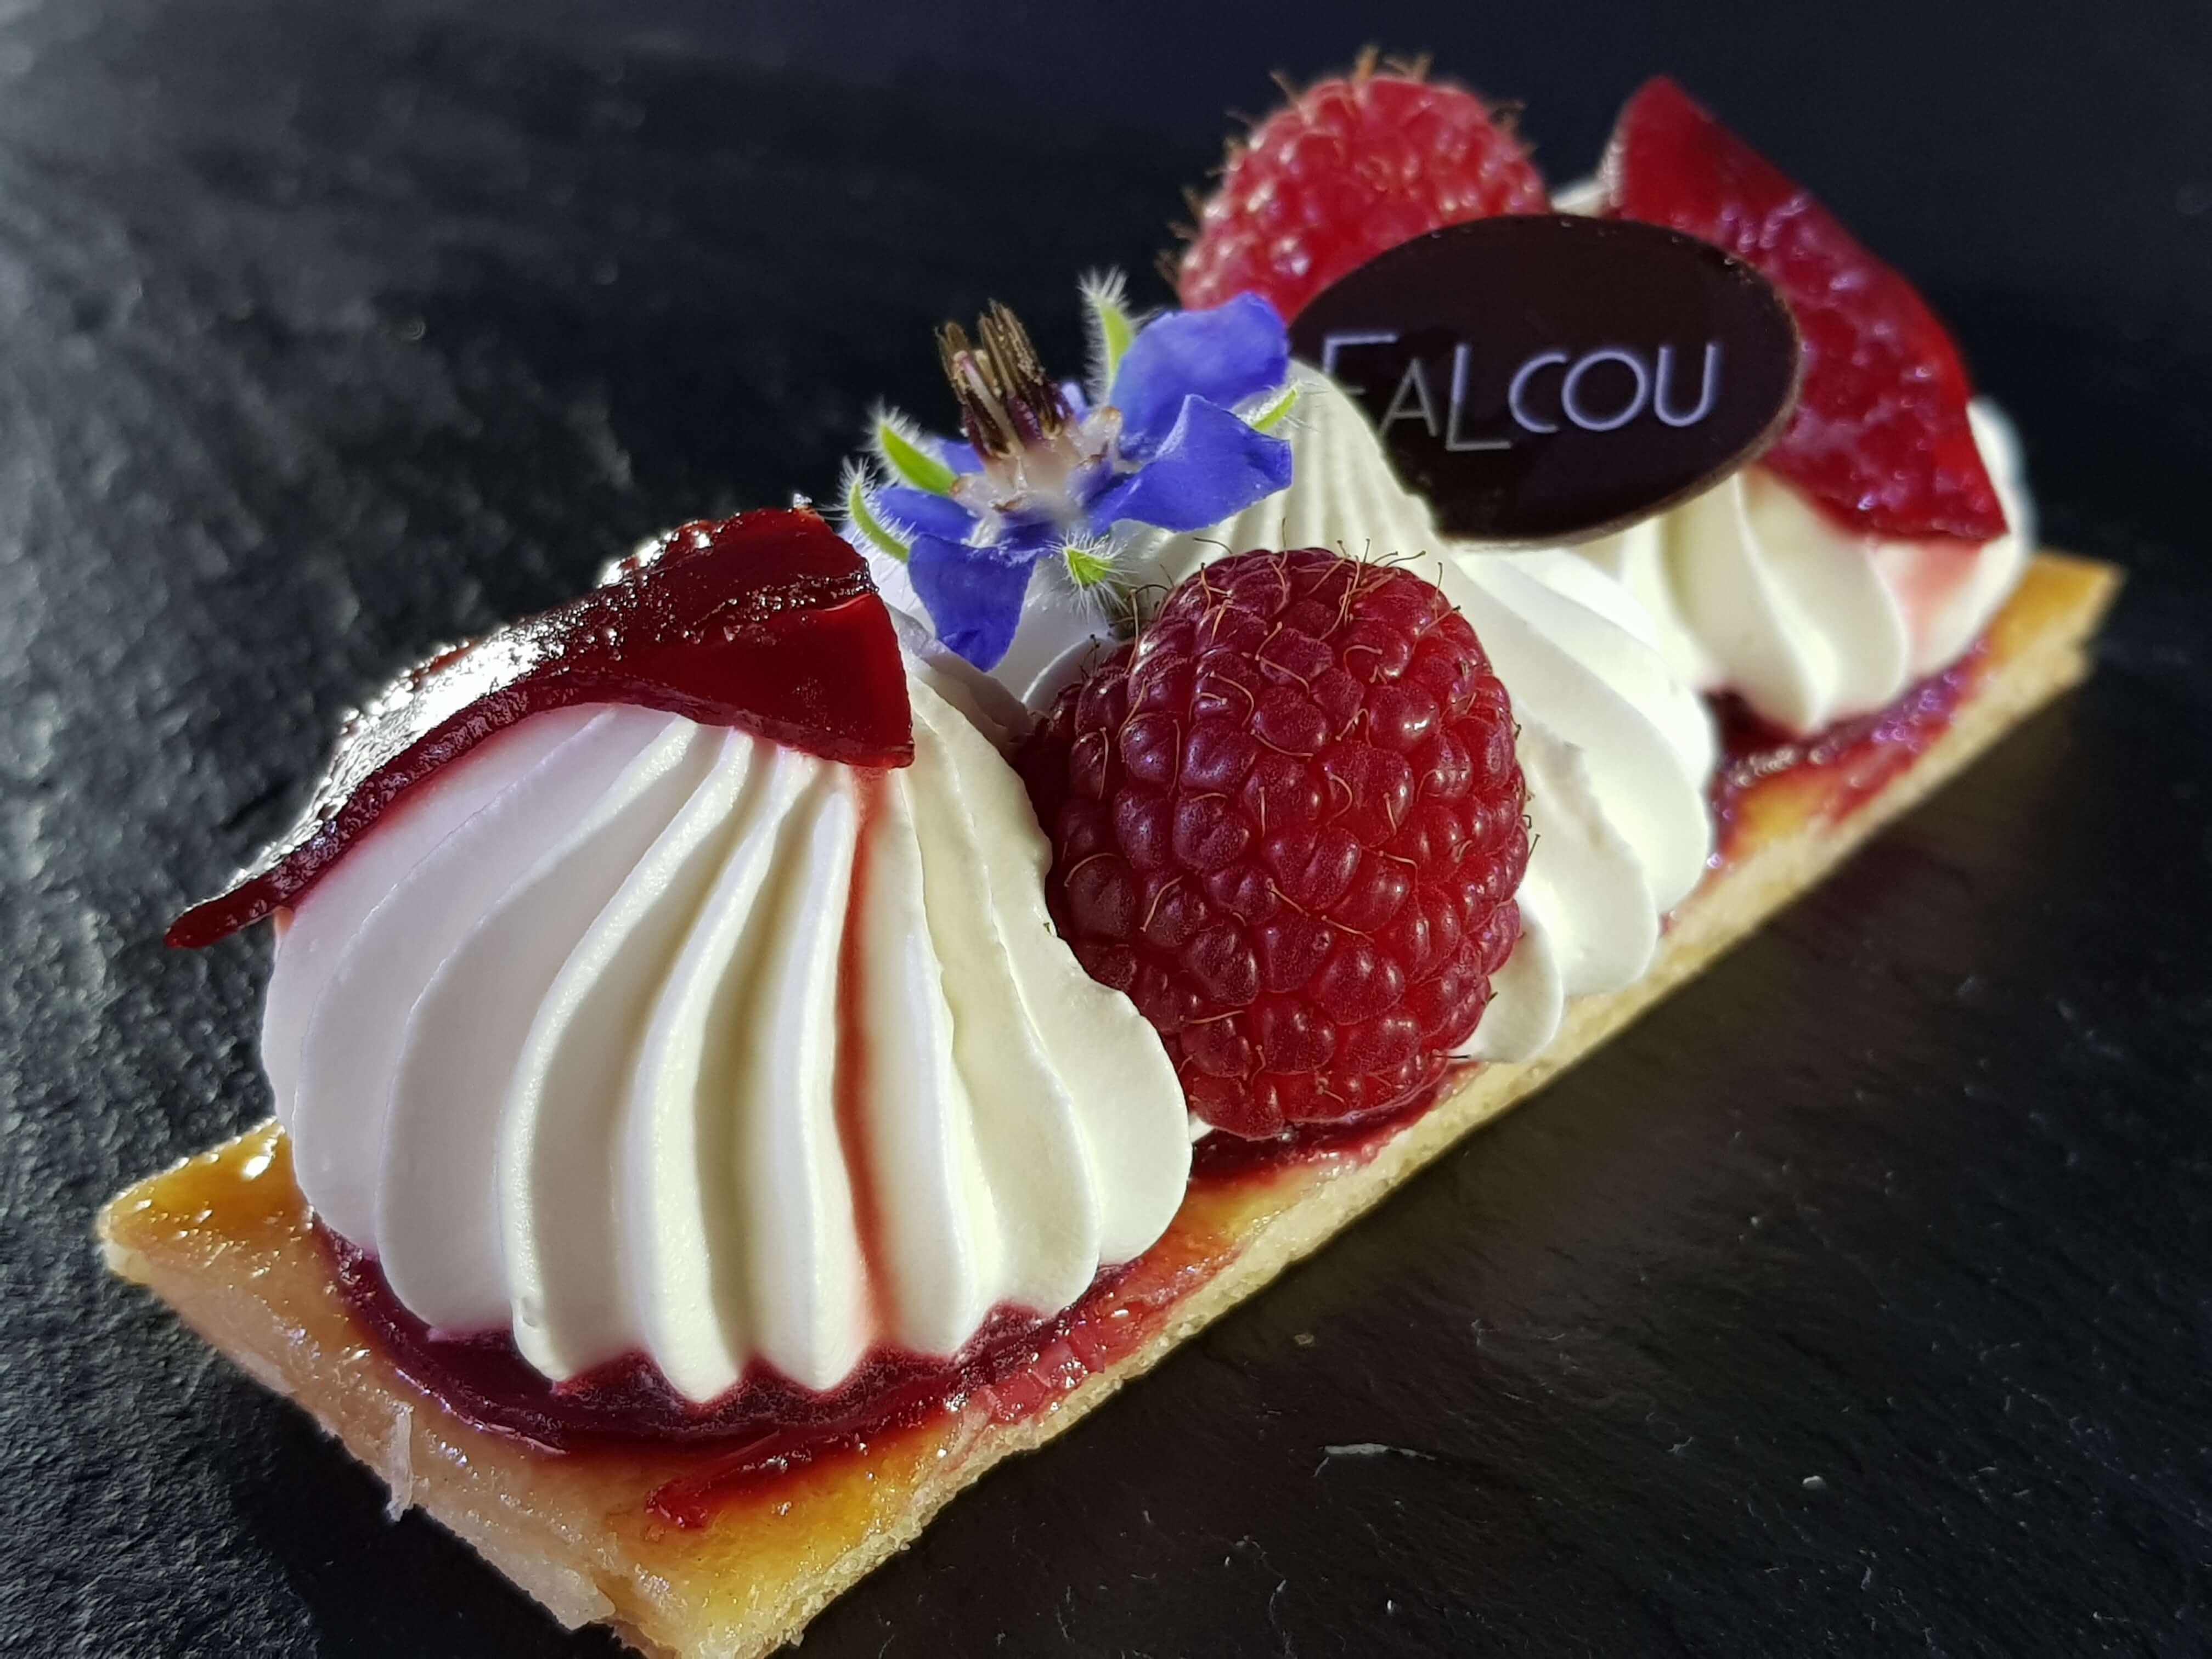 Recette de dessert Falcou